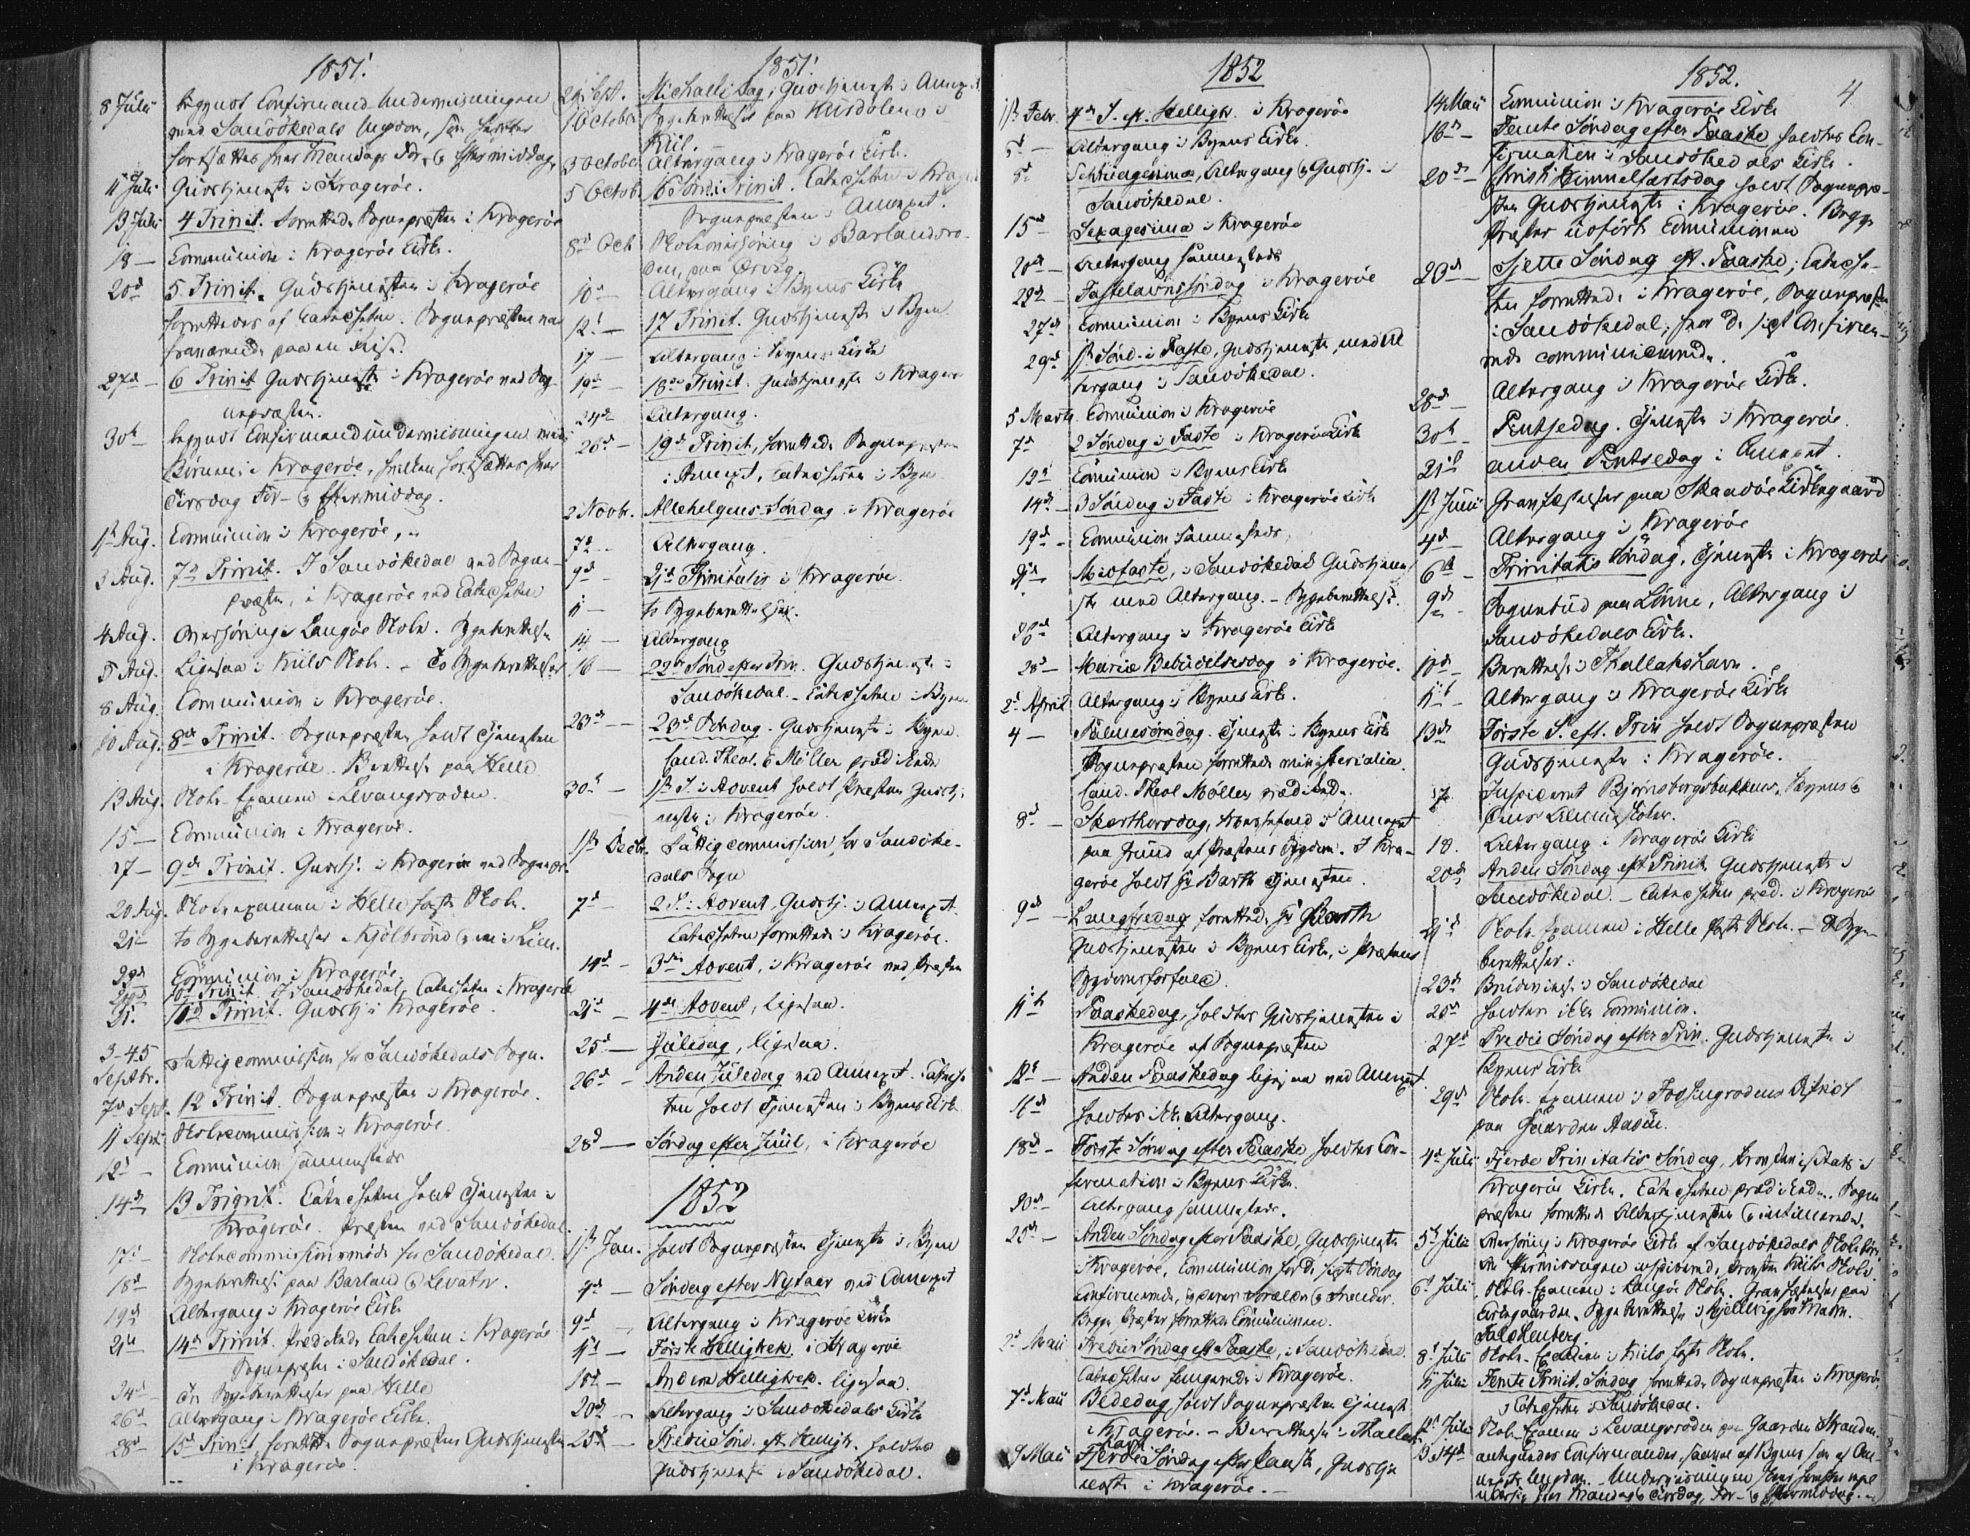 SAKO, Kragerø kirkebøker, F/Fa/L0006: Ministerialbok nr. 6, 1847-1861, s. 4